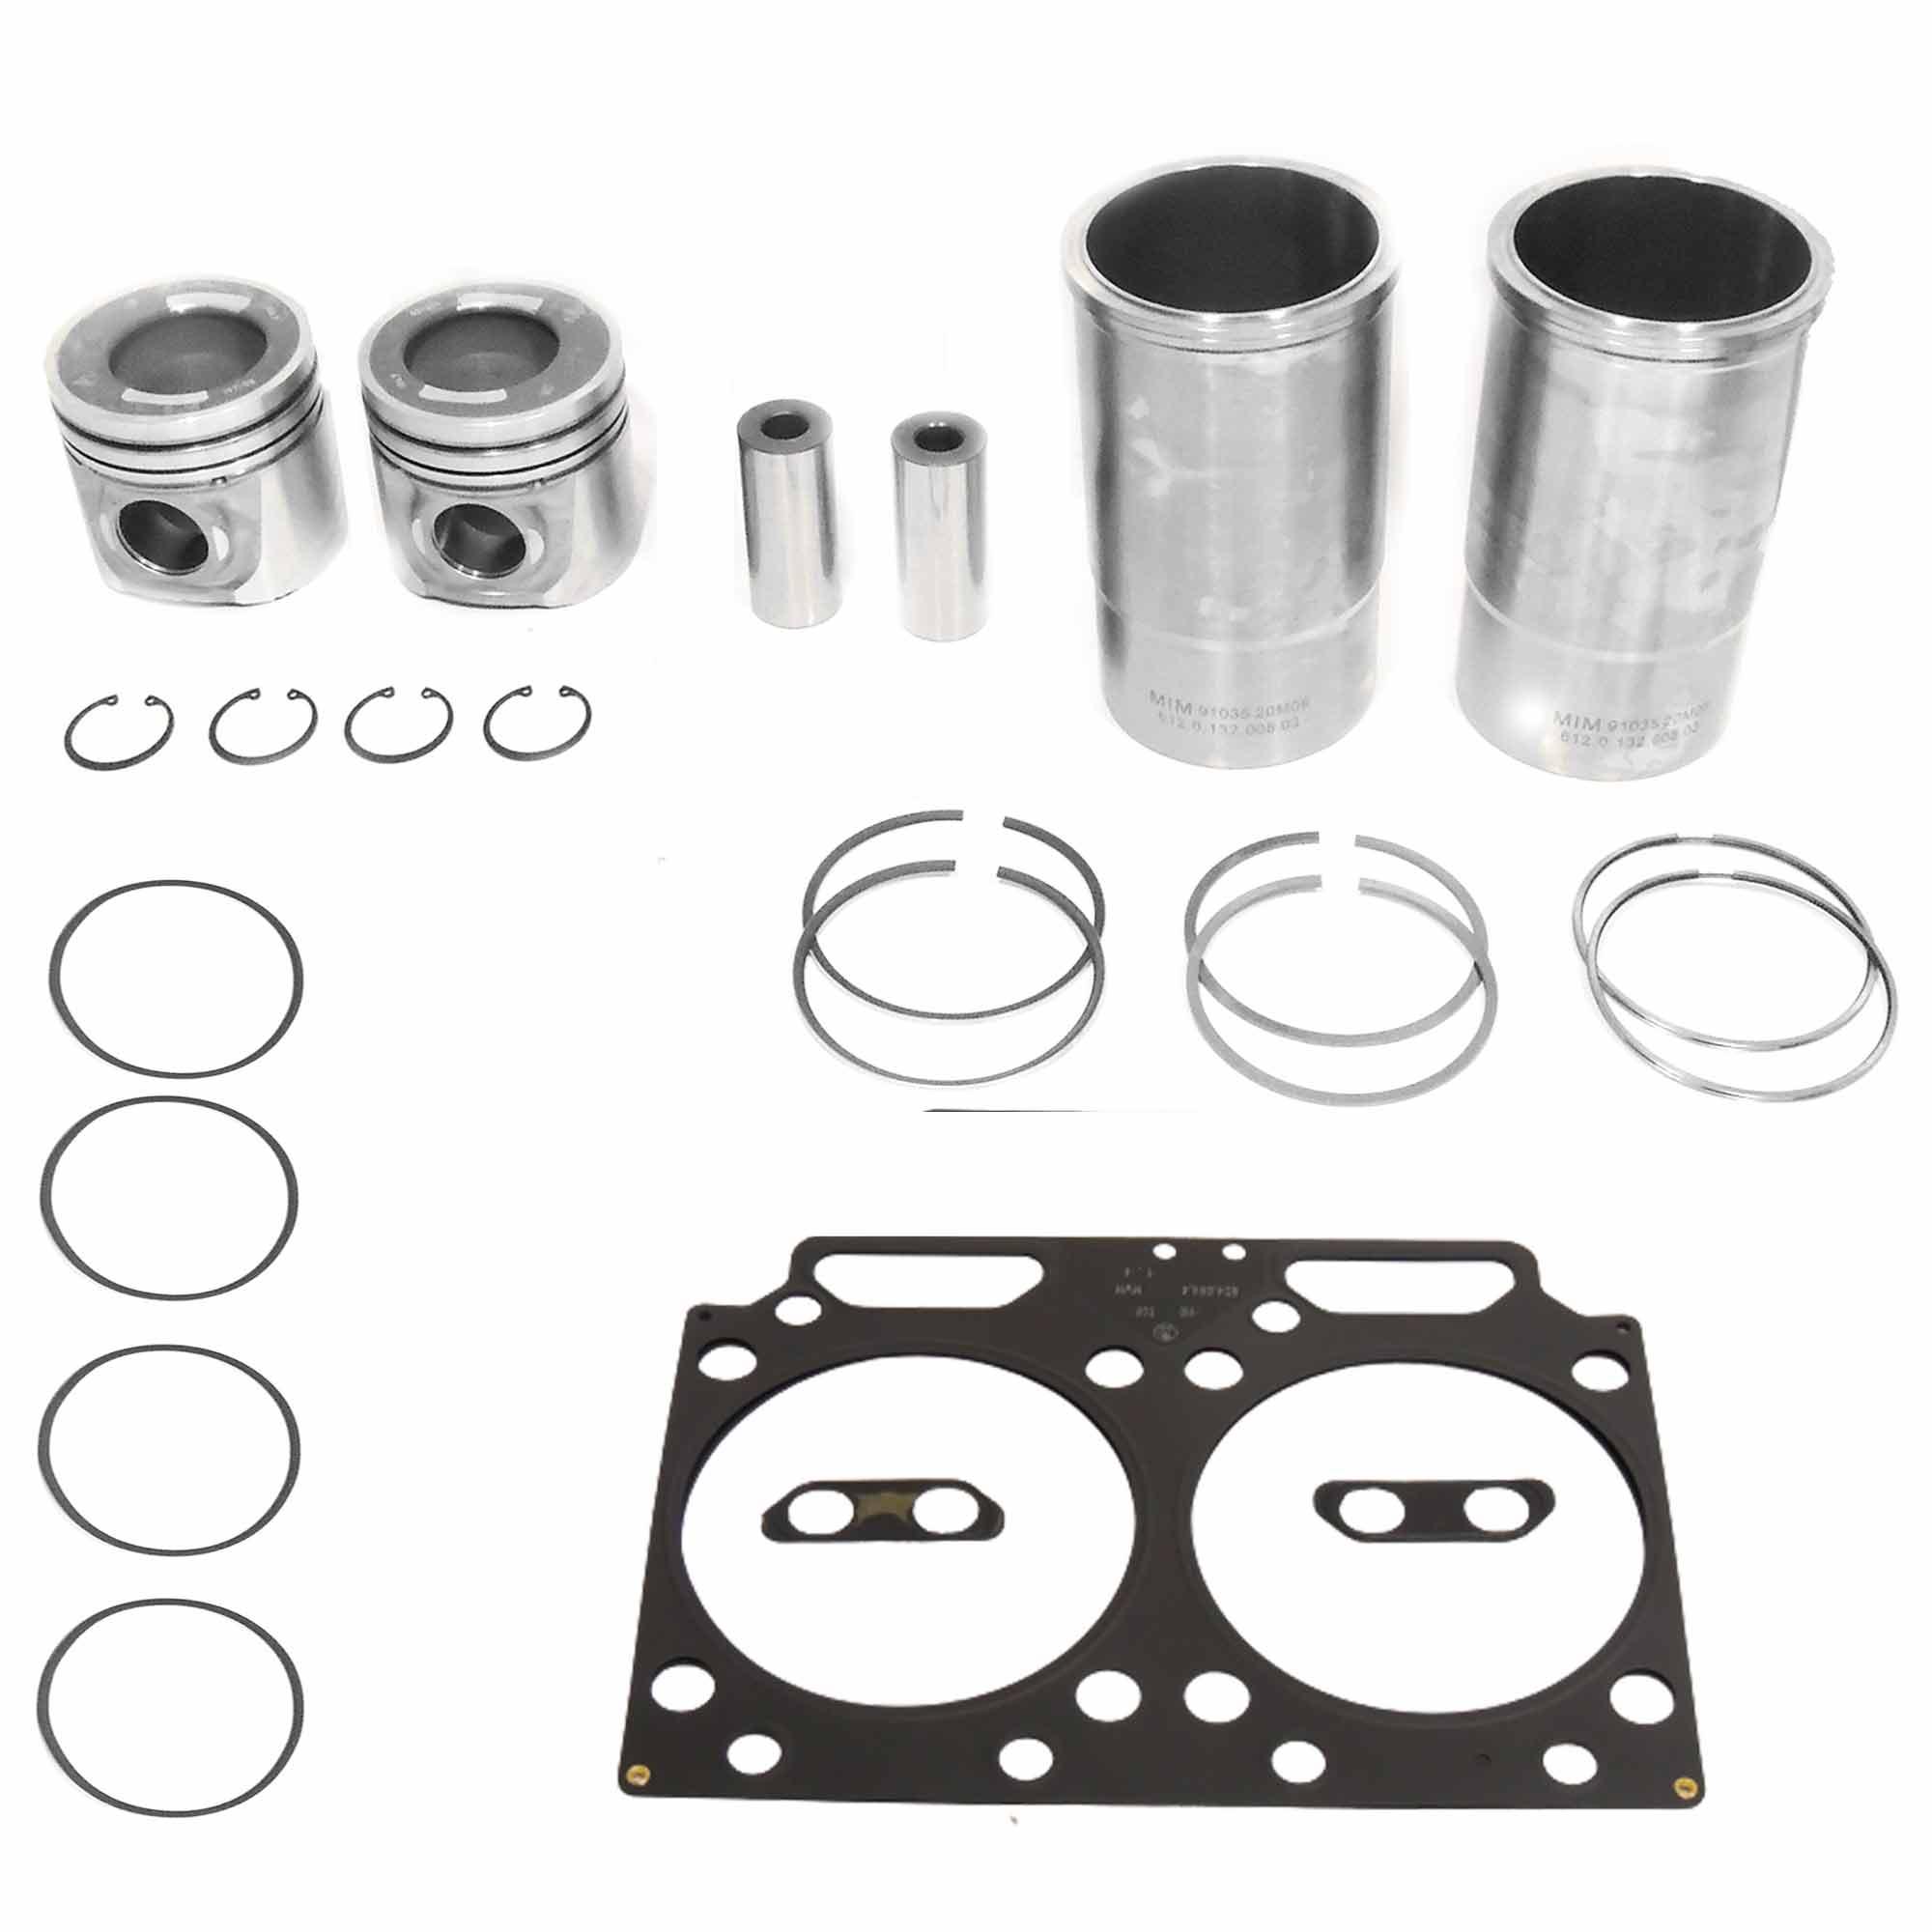 961280190478 - Kit de reparo para 2 cilindros - Master Kit